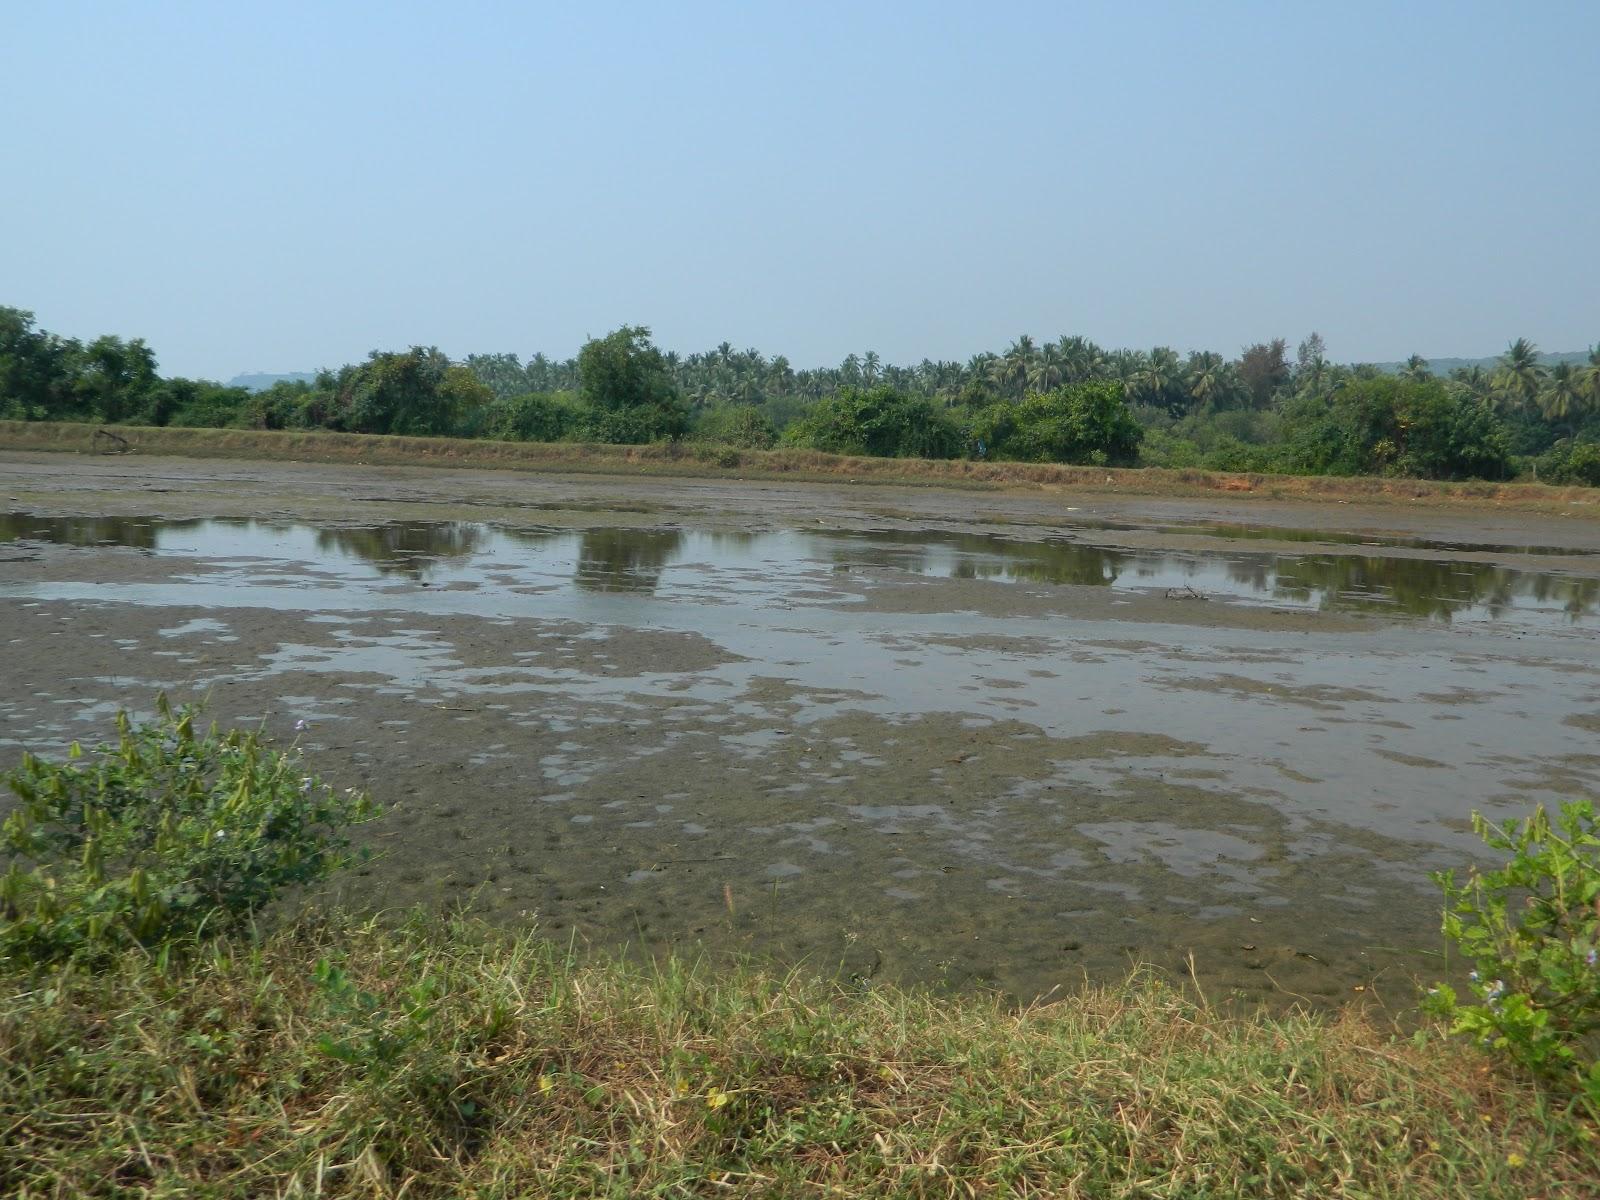 Mera Gaon Mera Base Kochra Konkan Maharashtra Present Condition Of Kochra Village